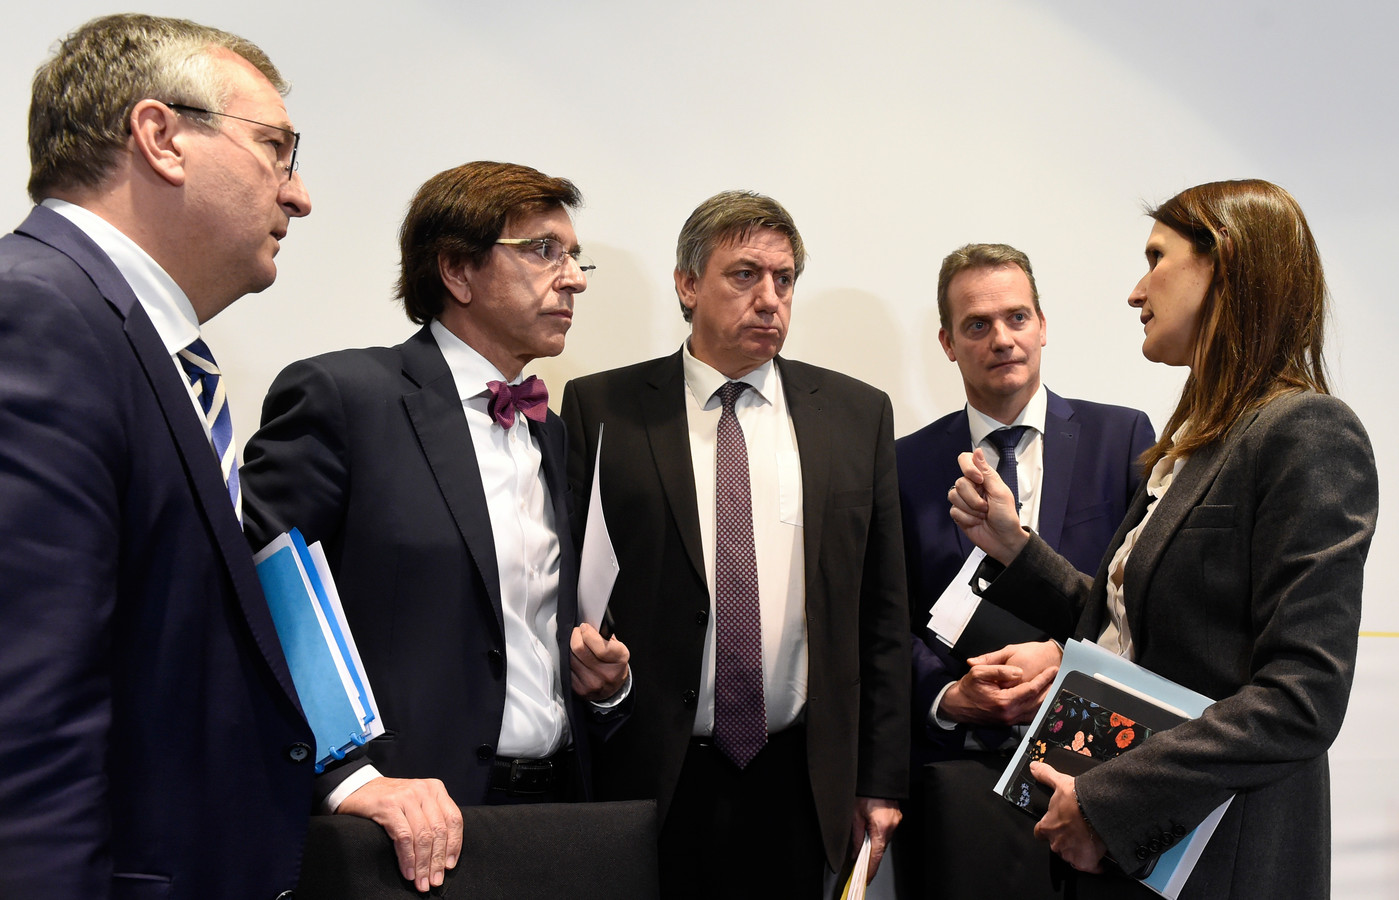 Pierre-Yves Jeholet, Elio Di Rupo, Jan Jambon, Oliver Paasch et Sophie Wilmes.